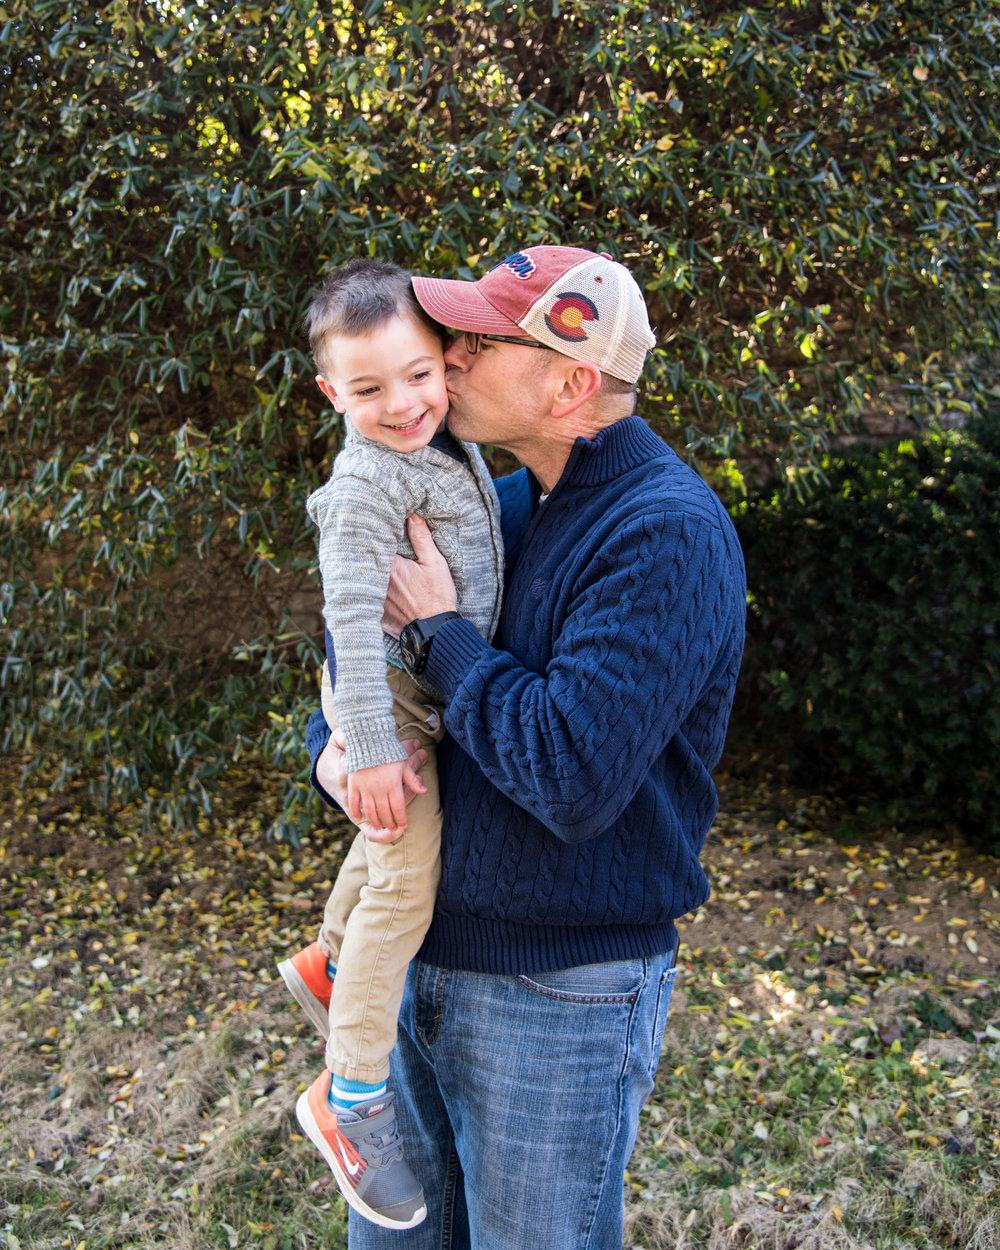 Kyla Jo Photography // Muncie, Indiana // Midwest Photographer // Family Photography in Indiana // Grandpa and Grandson Photos